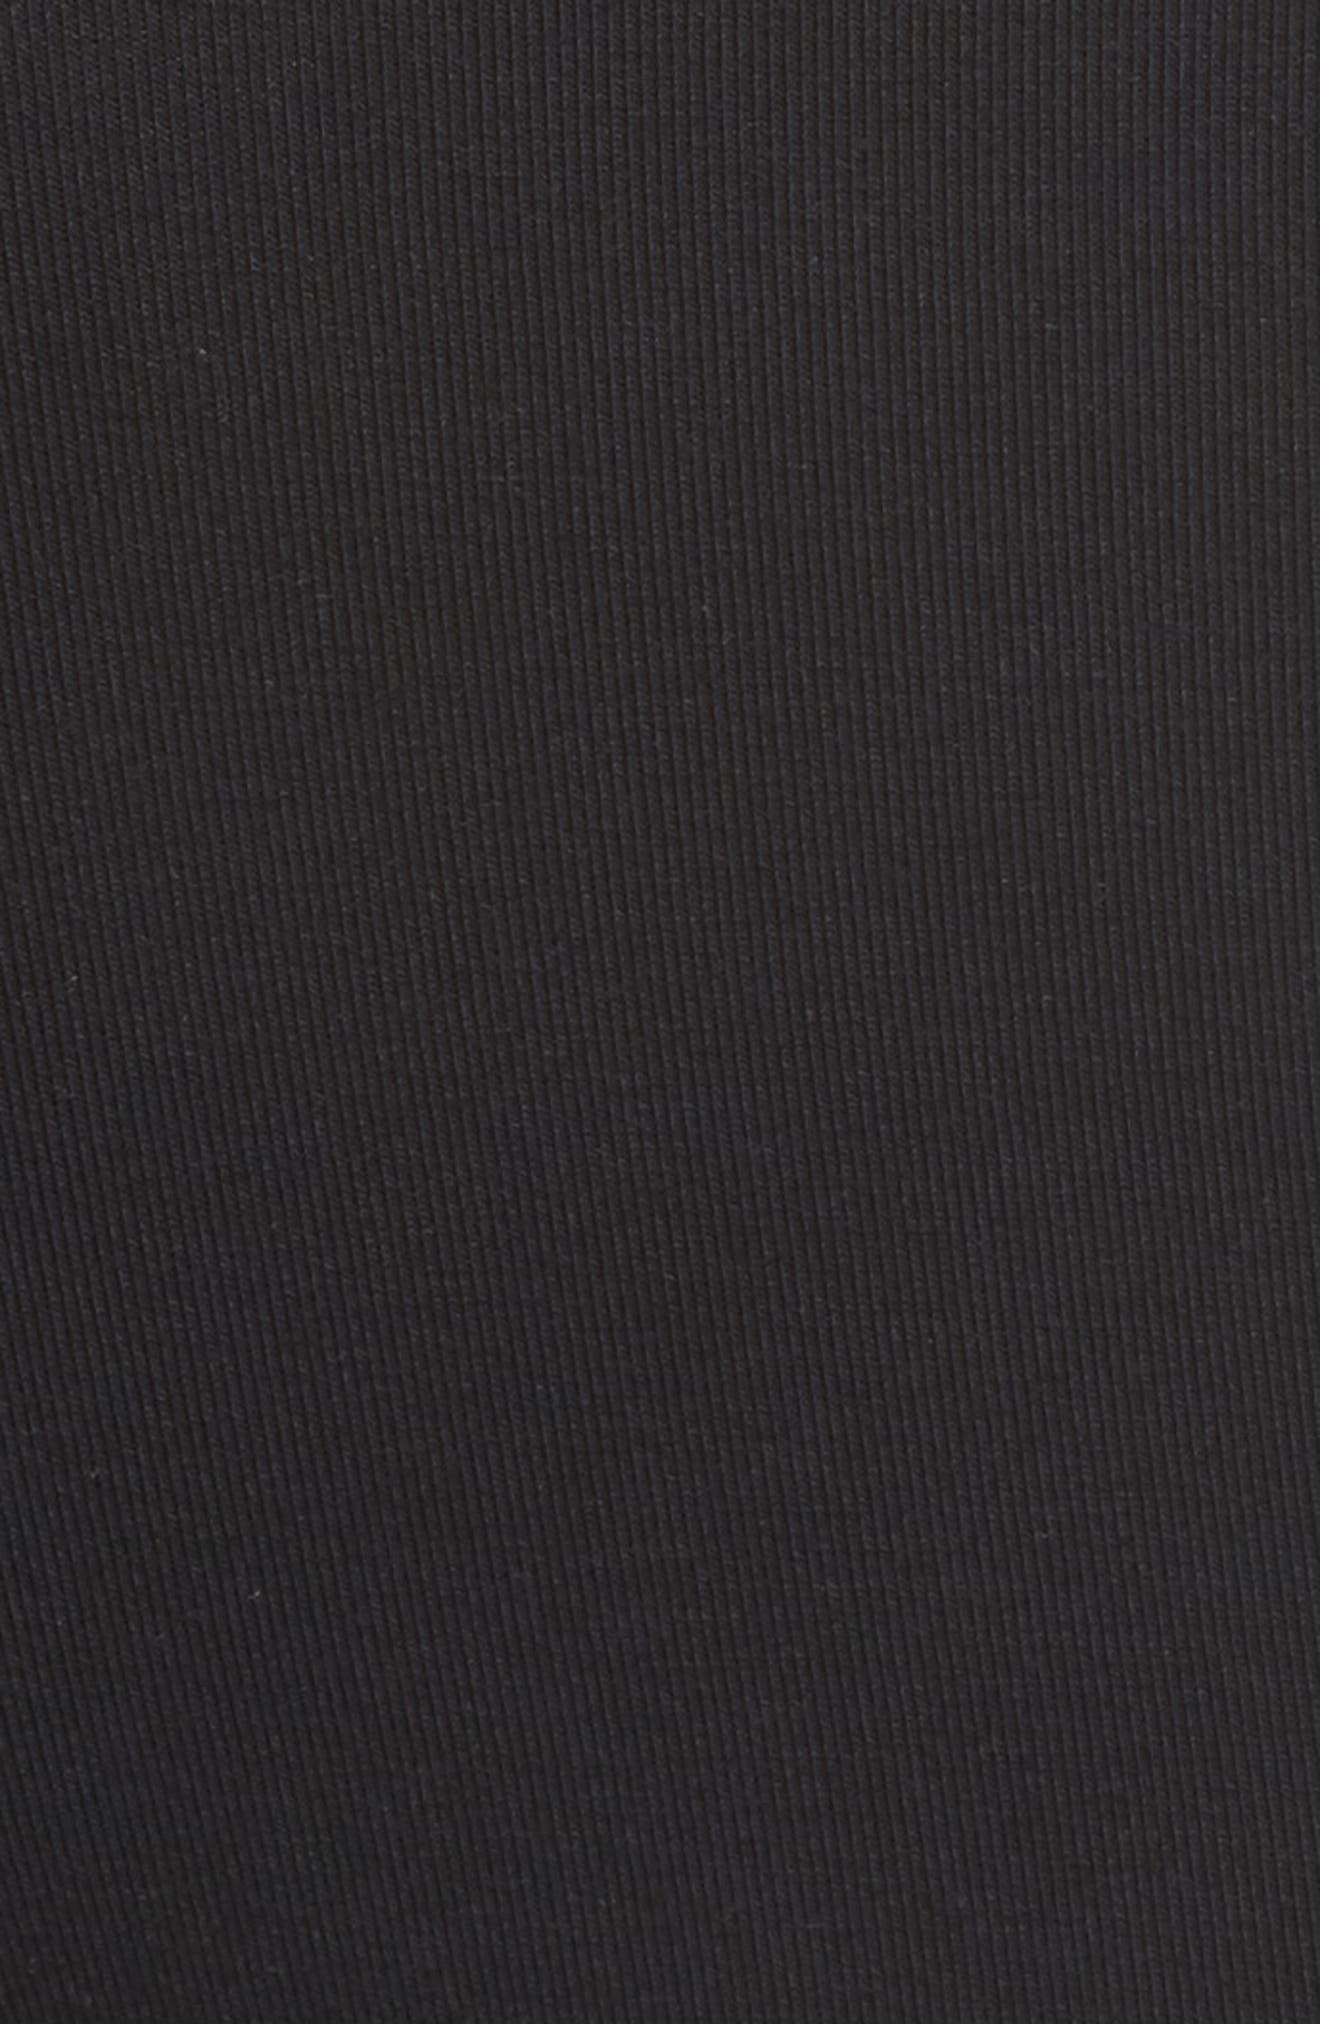 Sportswear Women's Leggings,                             Alternate thumbnail 6, color,                             Black/ Black/ Black